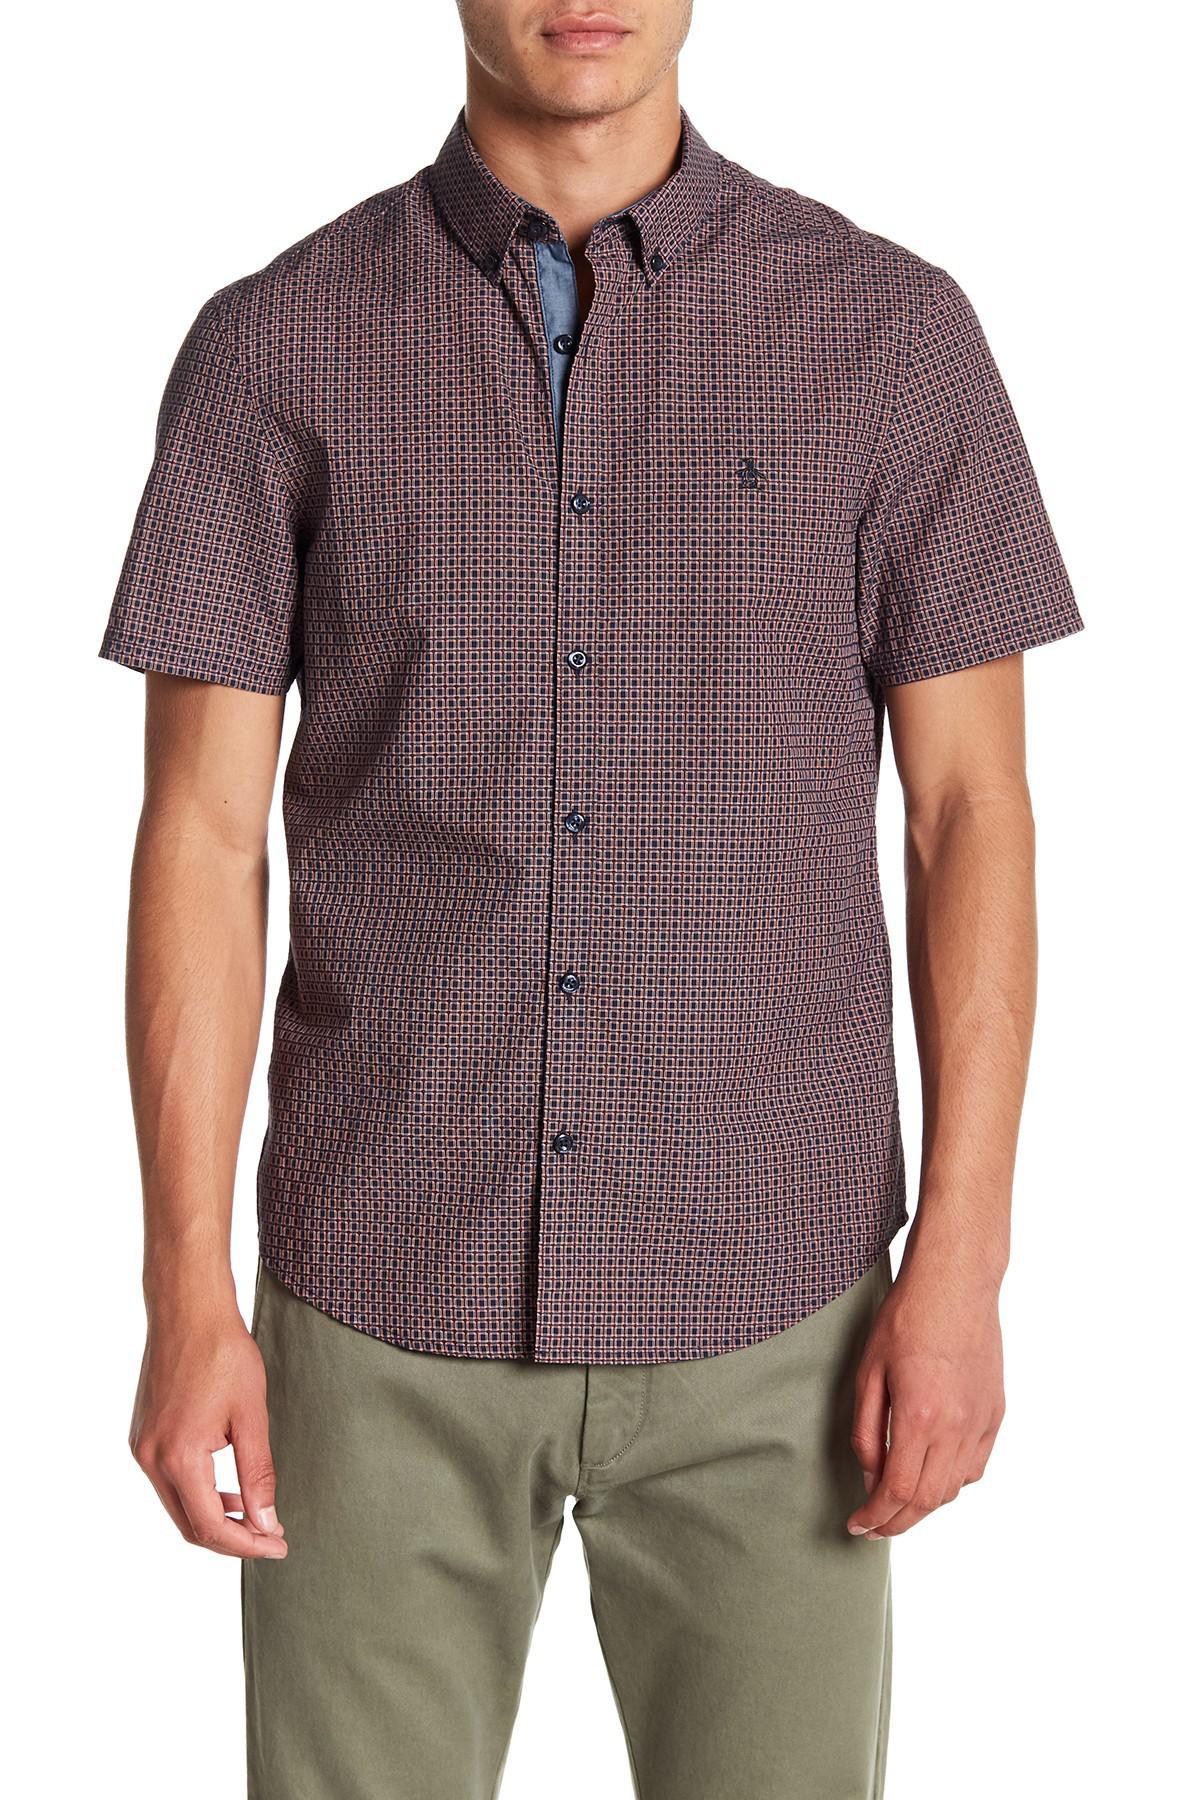 3fbb43c32d Mens Short Sleeve Shirt Clearance - BCD Tofu House